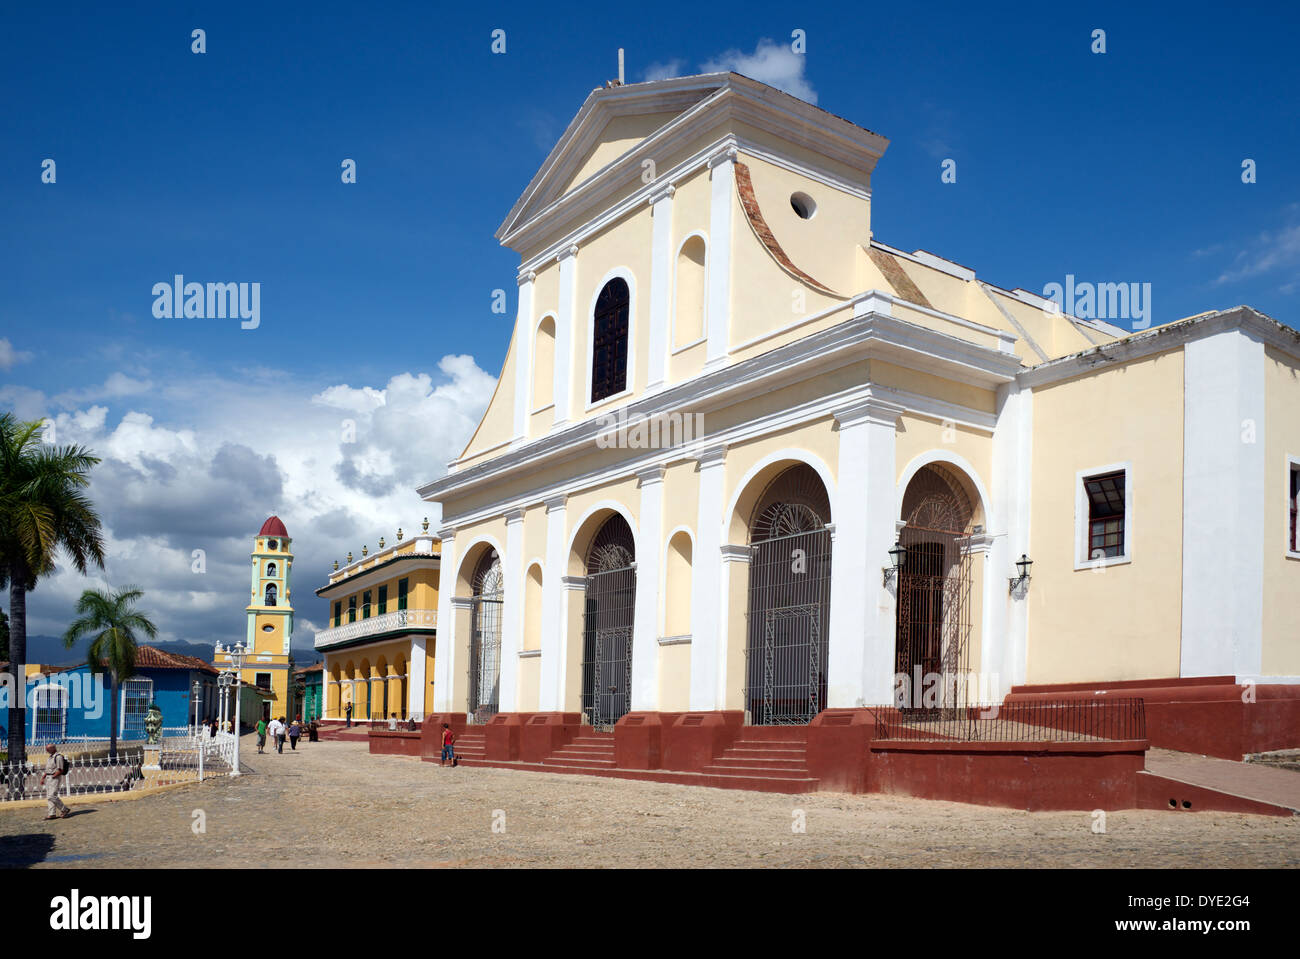 Plaza Major with Iglesia Parroquial de la Santisima historic centre Trinidad Sancti Spiritus Province Cuba - Stock Image